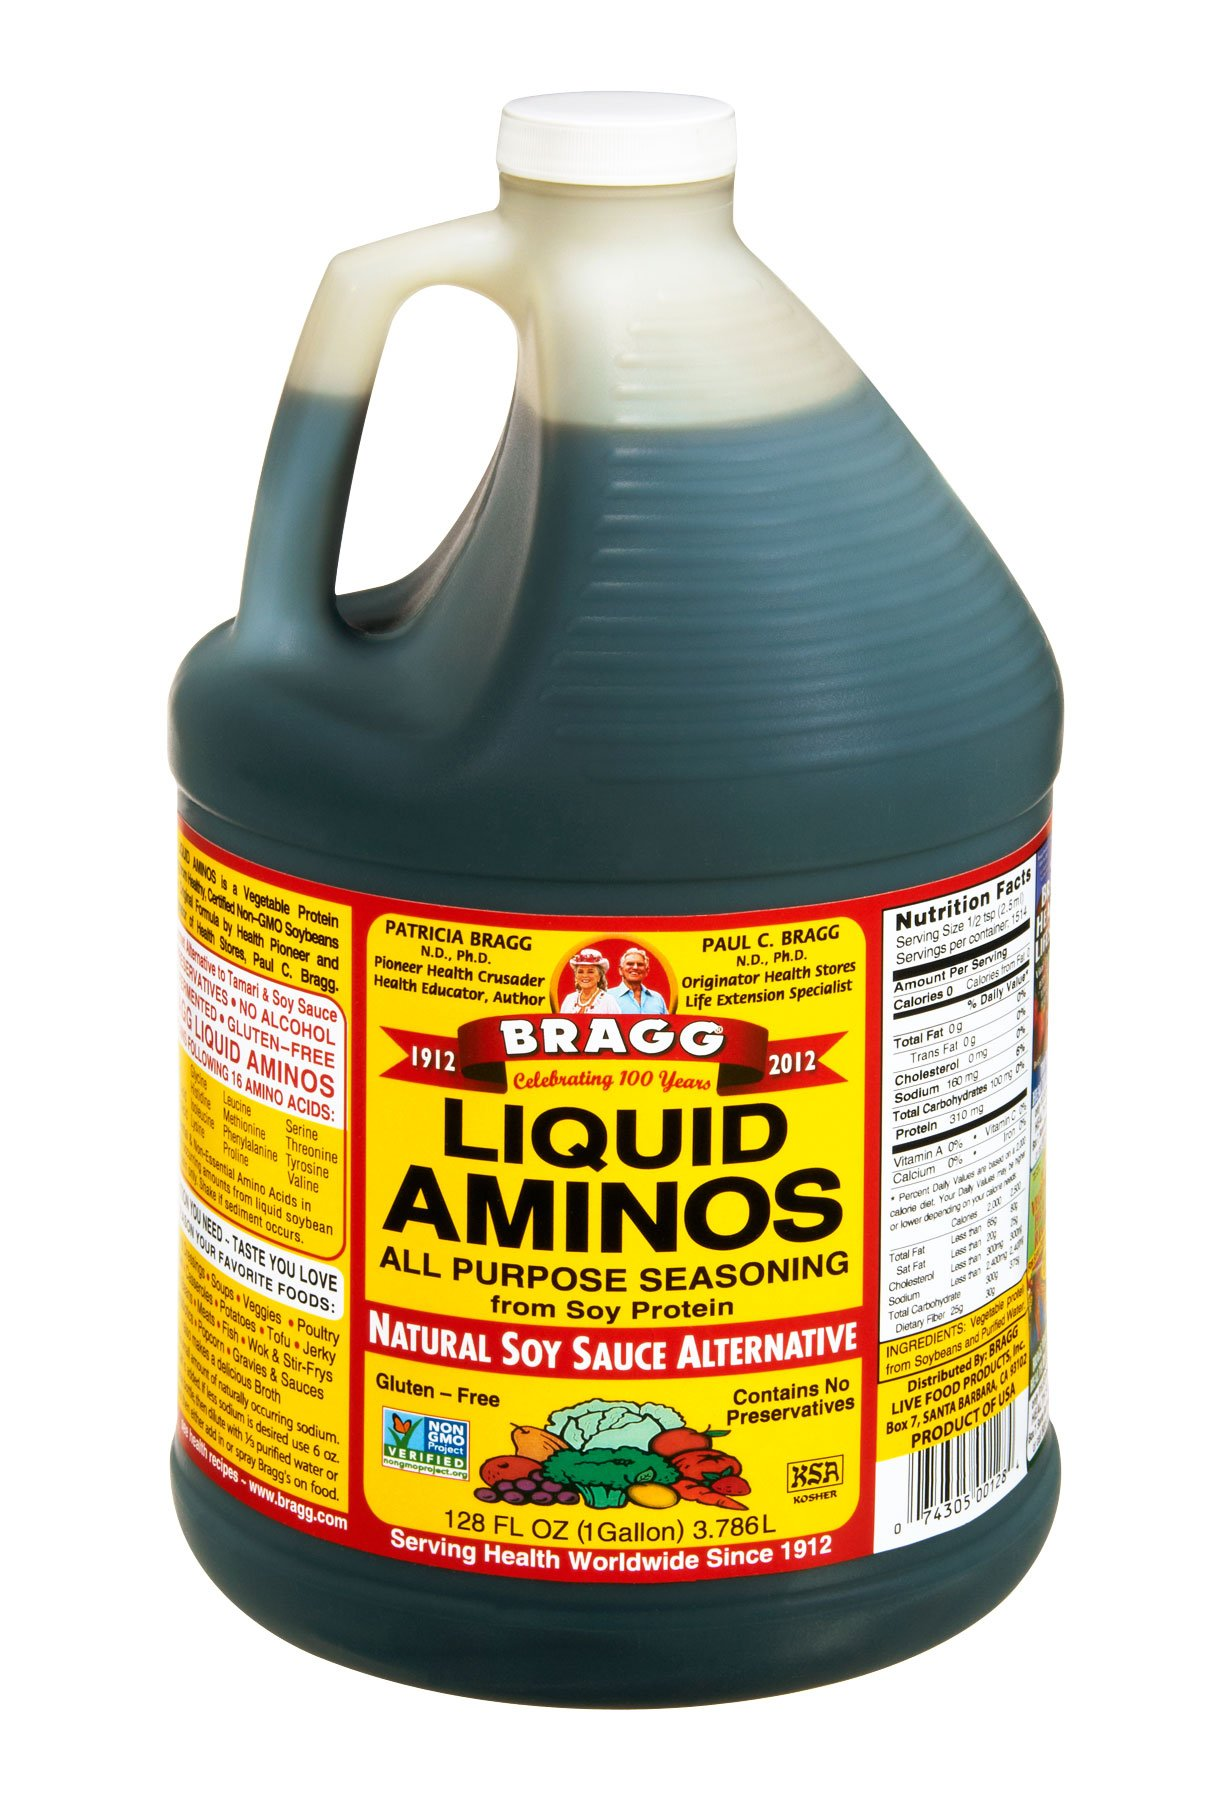 Bragg Liquid Aminos 1 Gallon by Bragg